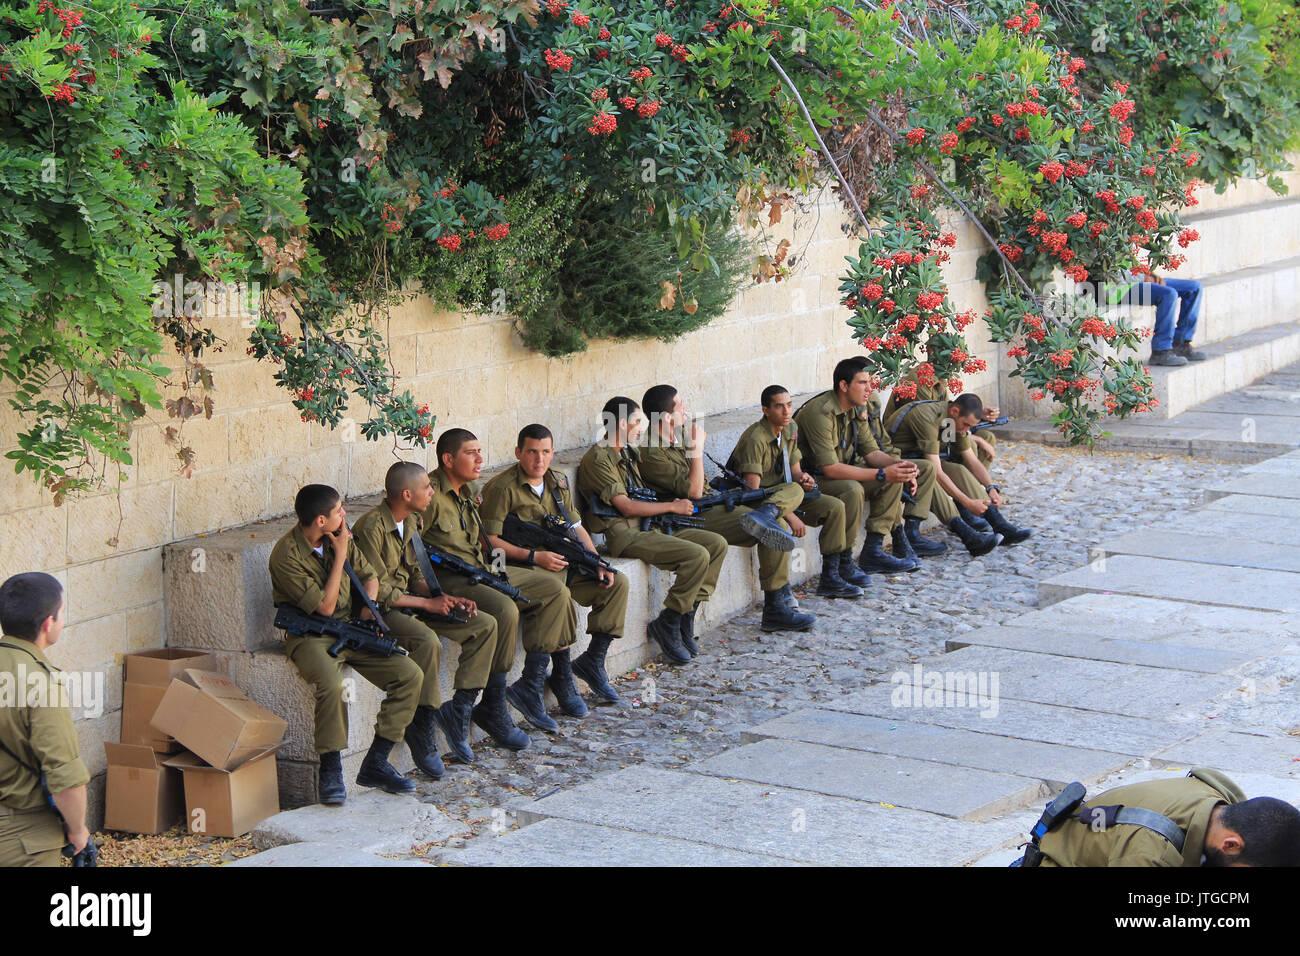 Jerusalem, Israel, October 24, 2013, Israeli troops waiting to be sworn in inside Old Jerusalem near the Wailing Wall. - Stock Image